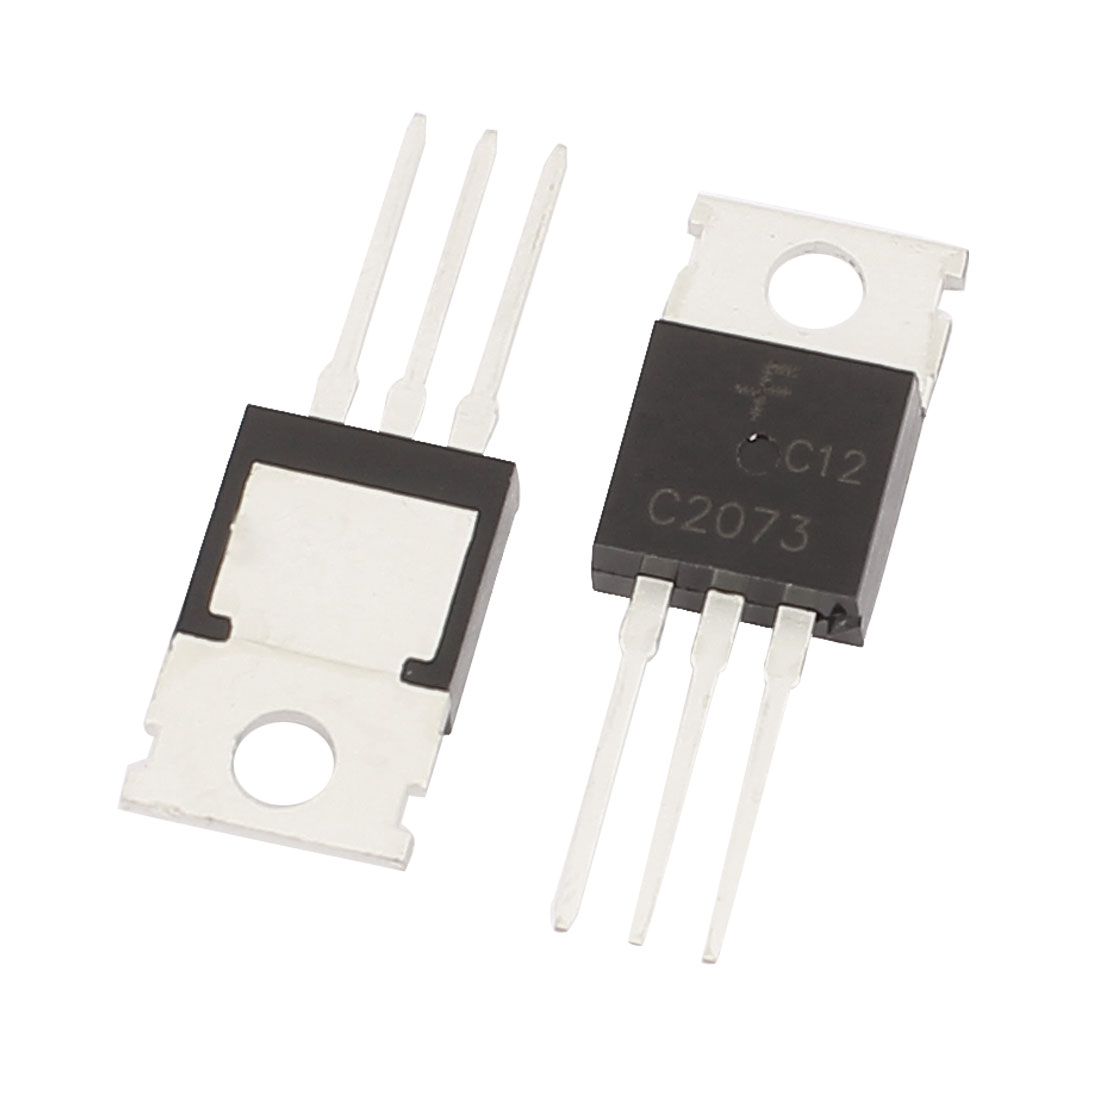 2 Pcs 150V 1.5A 3 Pin Terminals C2073 NPN Power Transistor TO-220